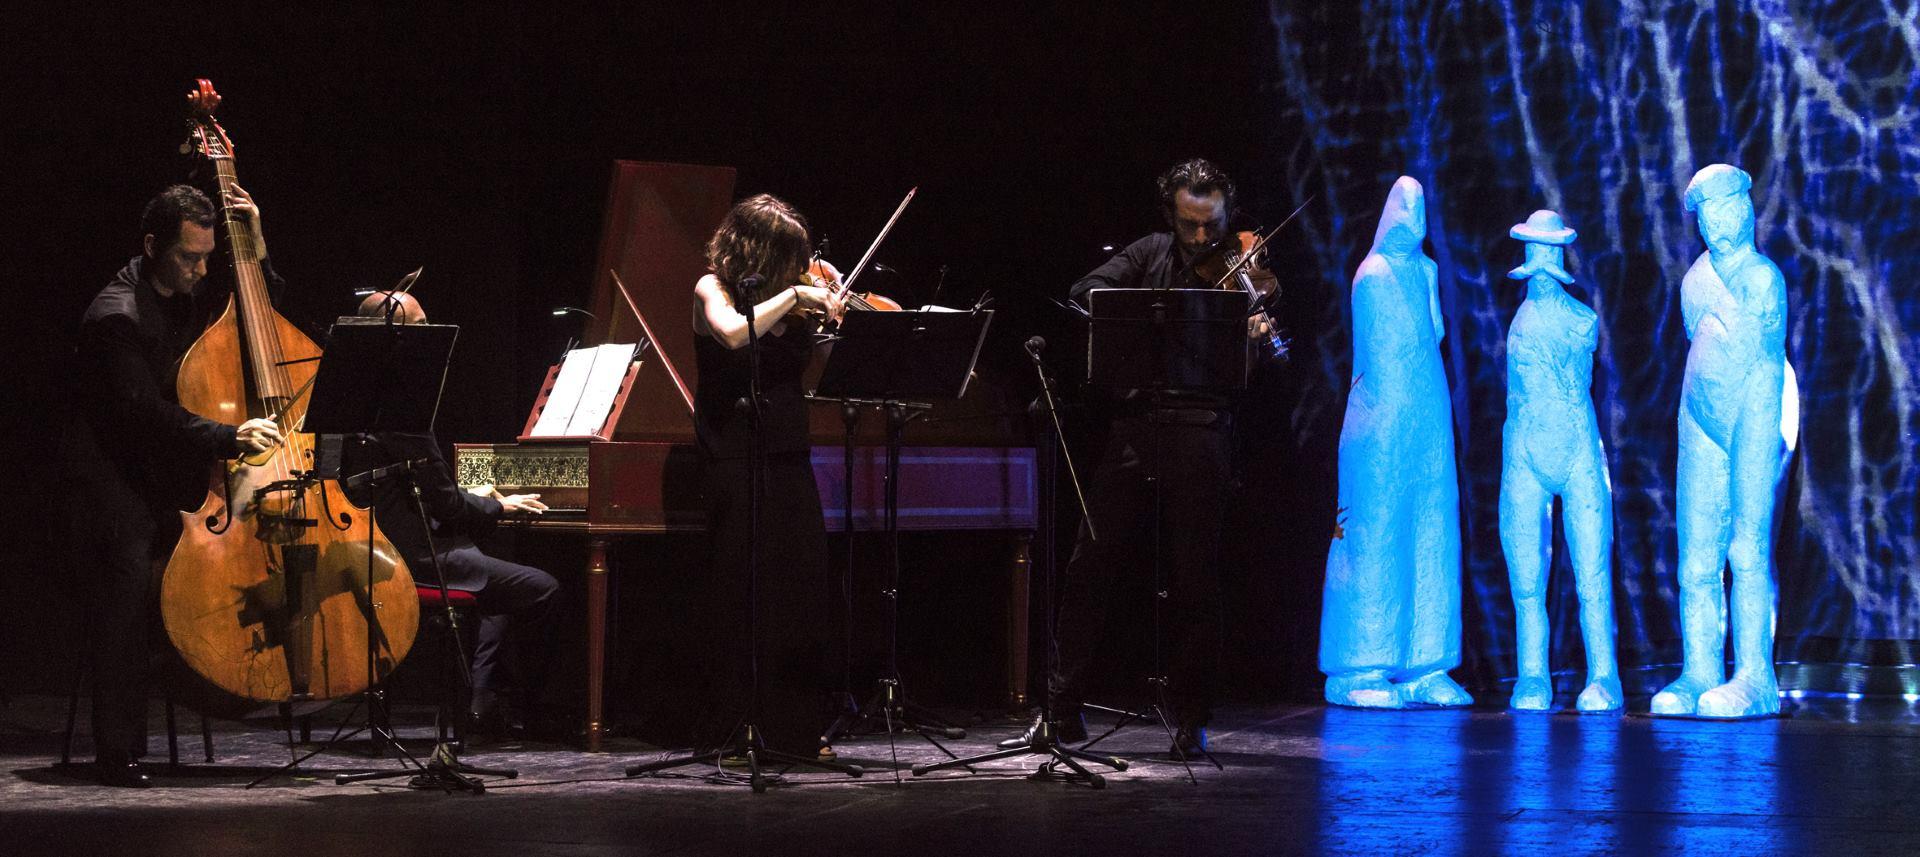 Scenski kolektiv La Fura dels Baus dolazi sa svojom poznatom predstavom